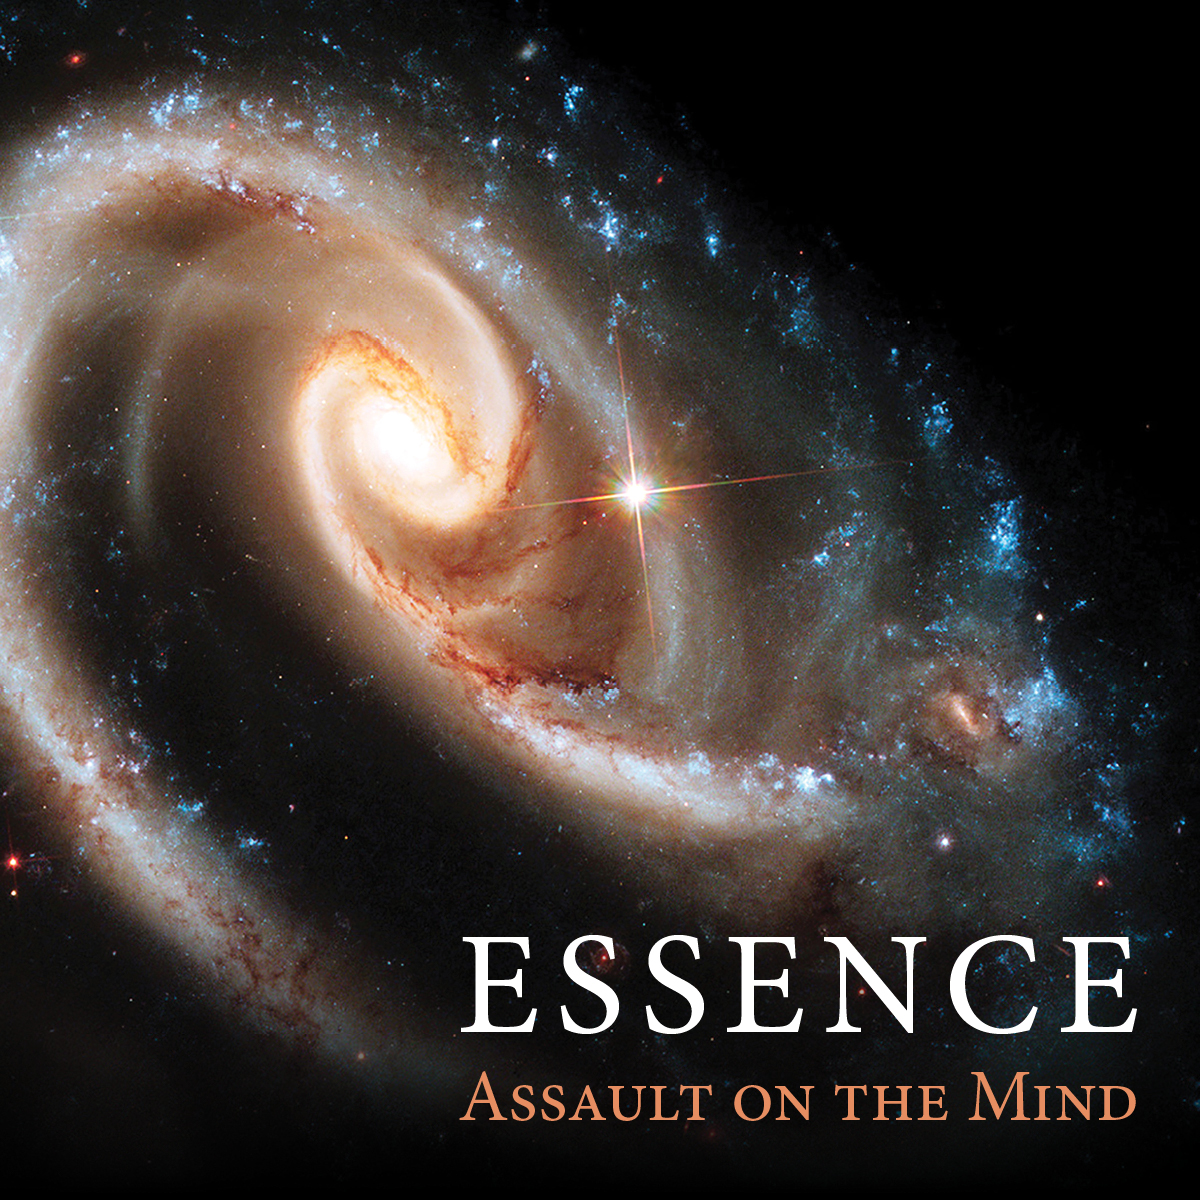 Essence-Digital-Square1.jpg